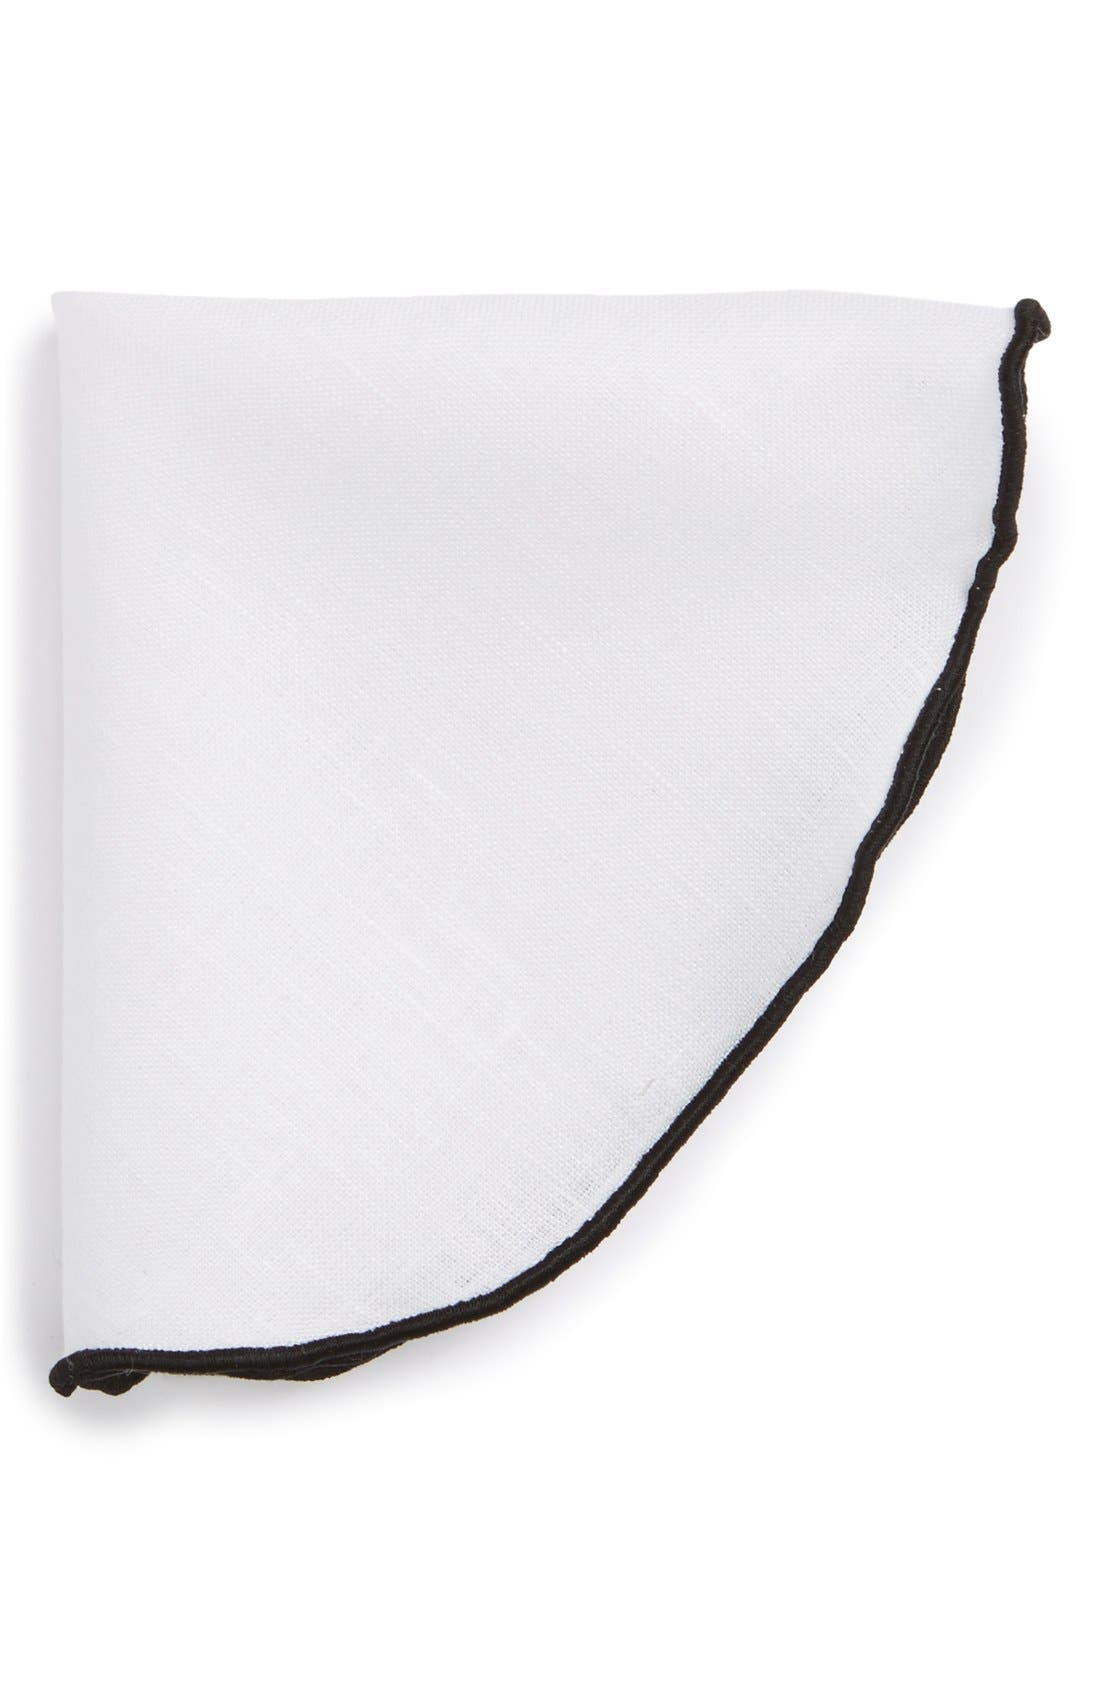 Linen Pocket Round,                         Main,                         color, White/ Black Trim